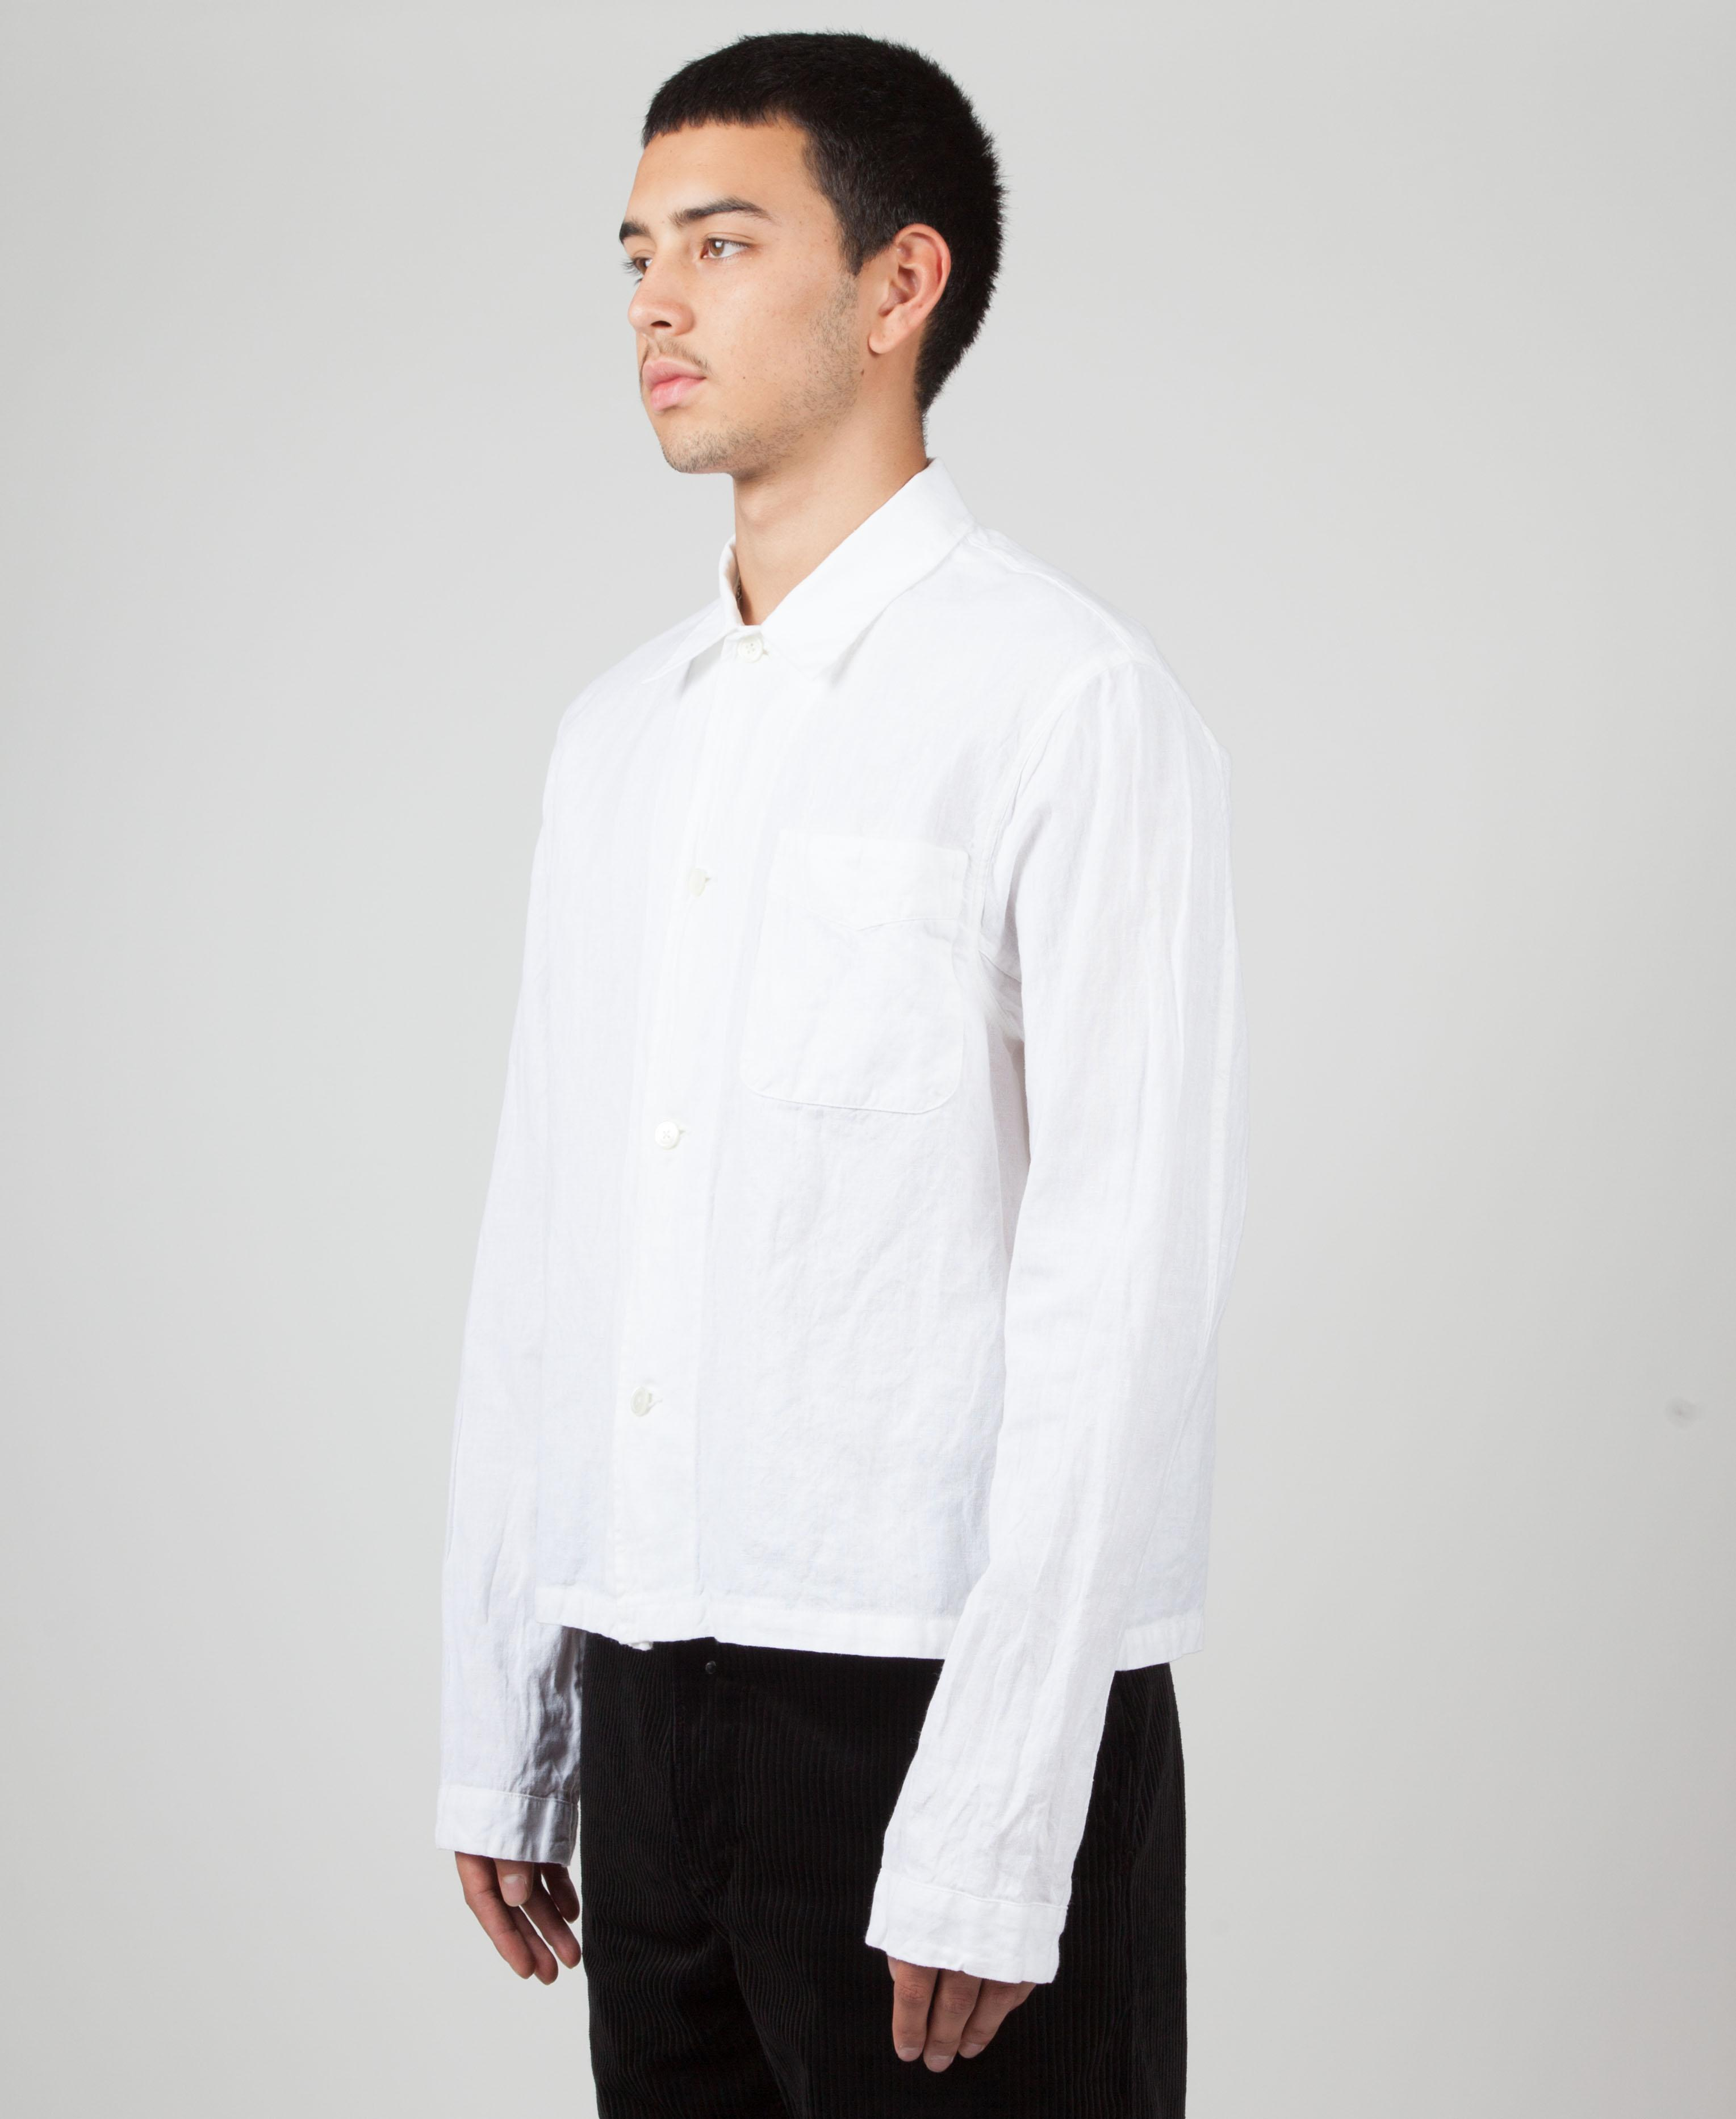 f9332be5f78db Lyst - Our Legacy Shrunken Shirt in White for Men